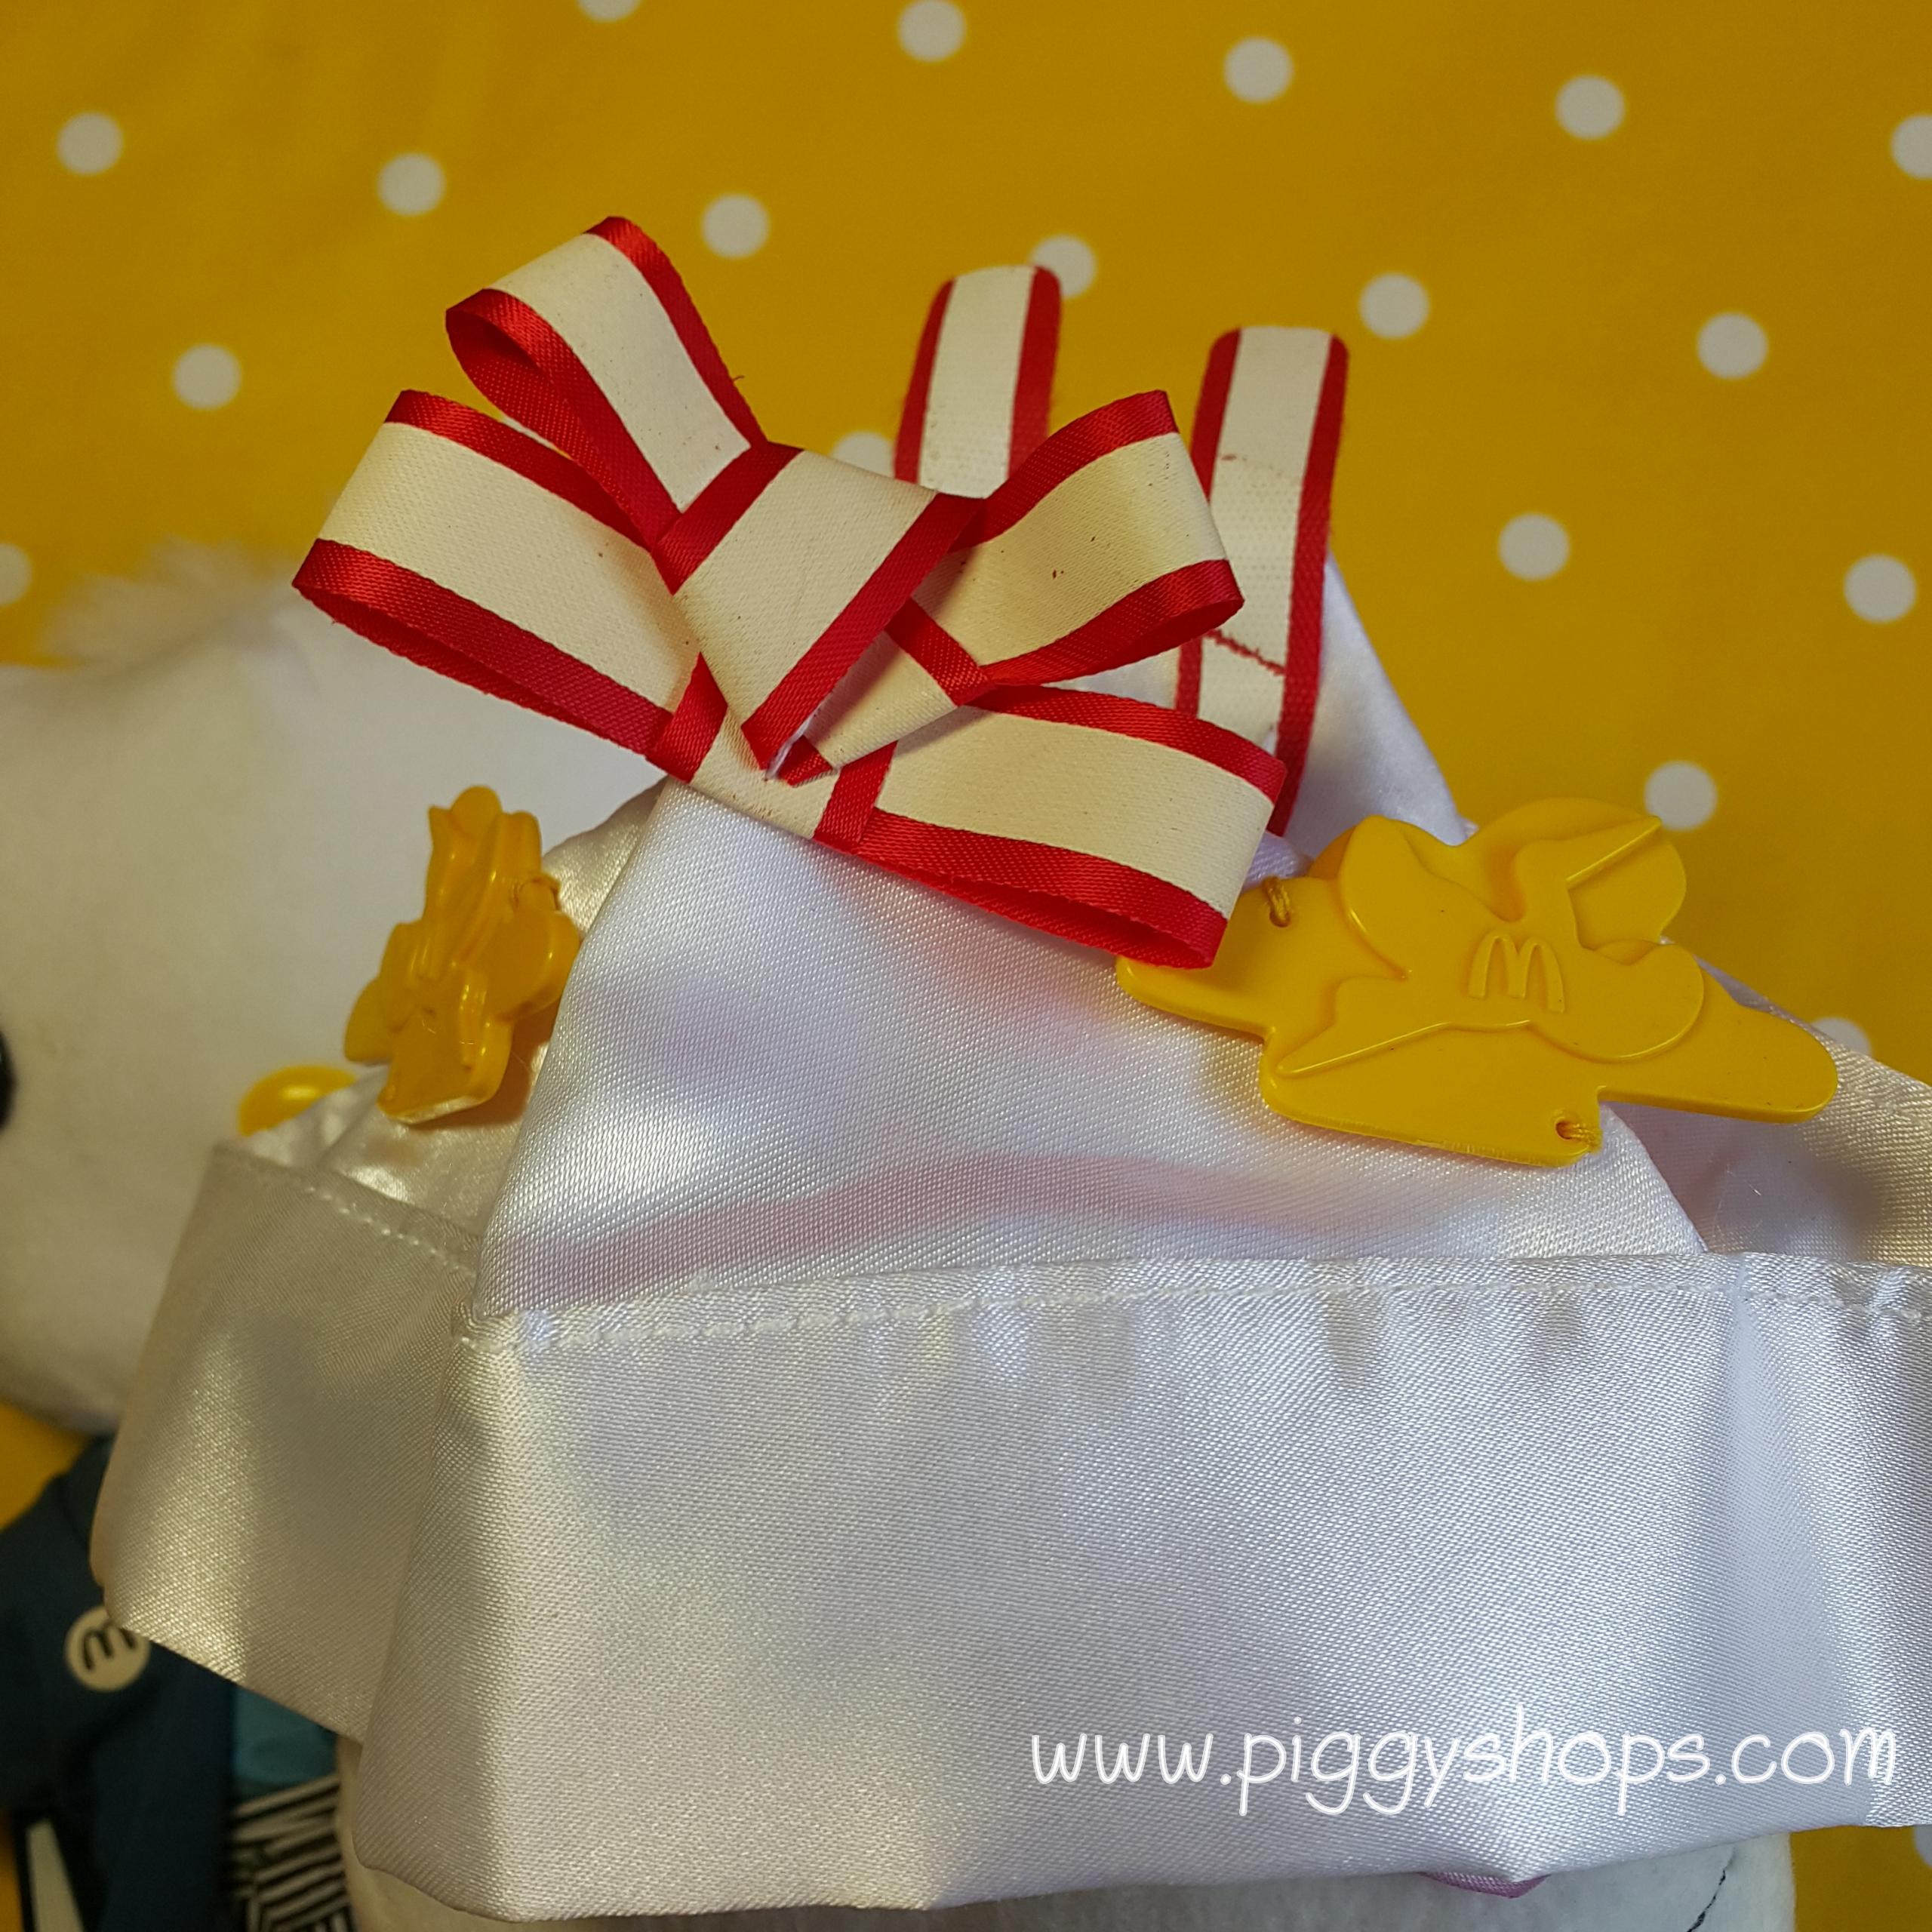 Hello Kitty & Daniel x McDonald's 2000 McSweet # Japanese Wedding แดเนียล เฮลโหลคิตตี้ ชุดแต่งงานประจำชาติญี่ปุ่น